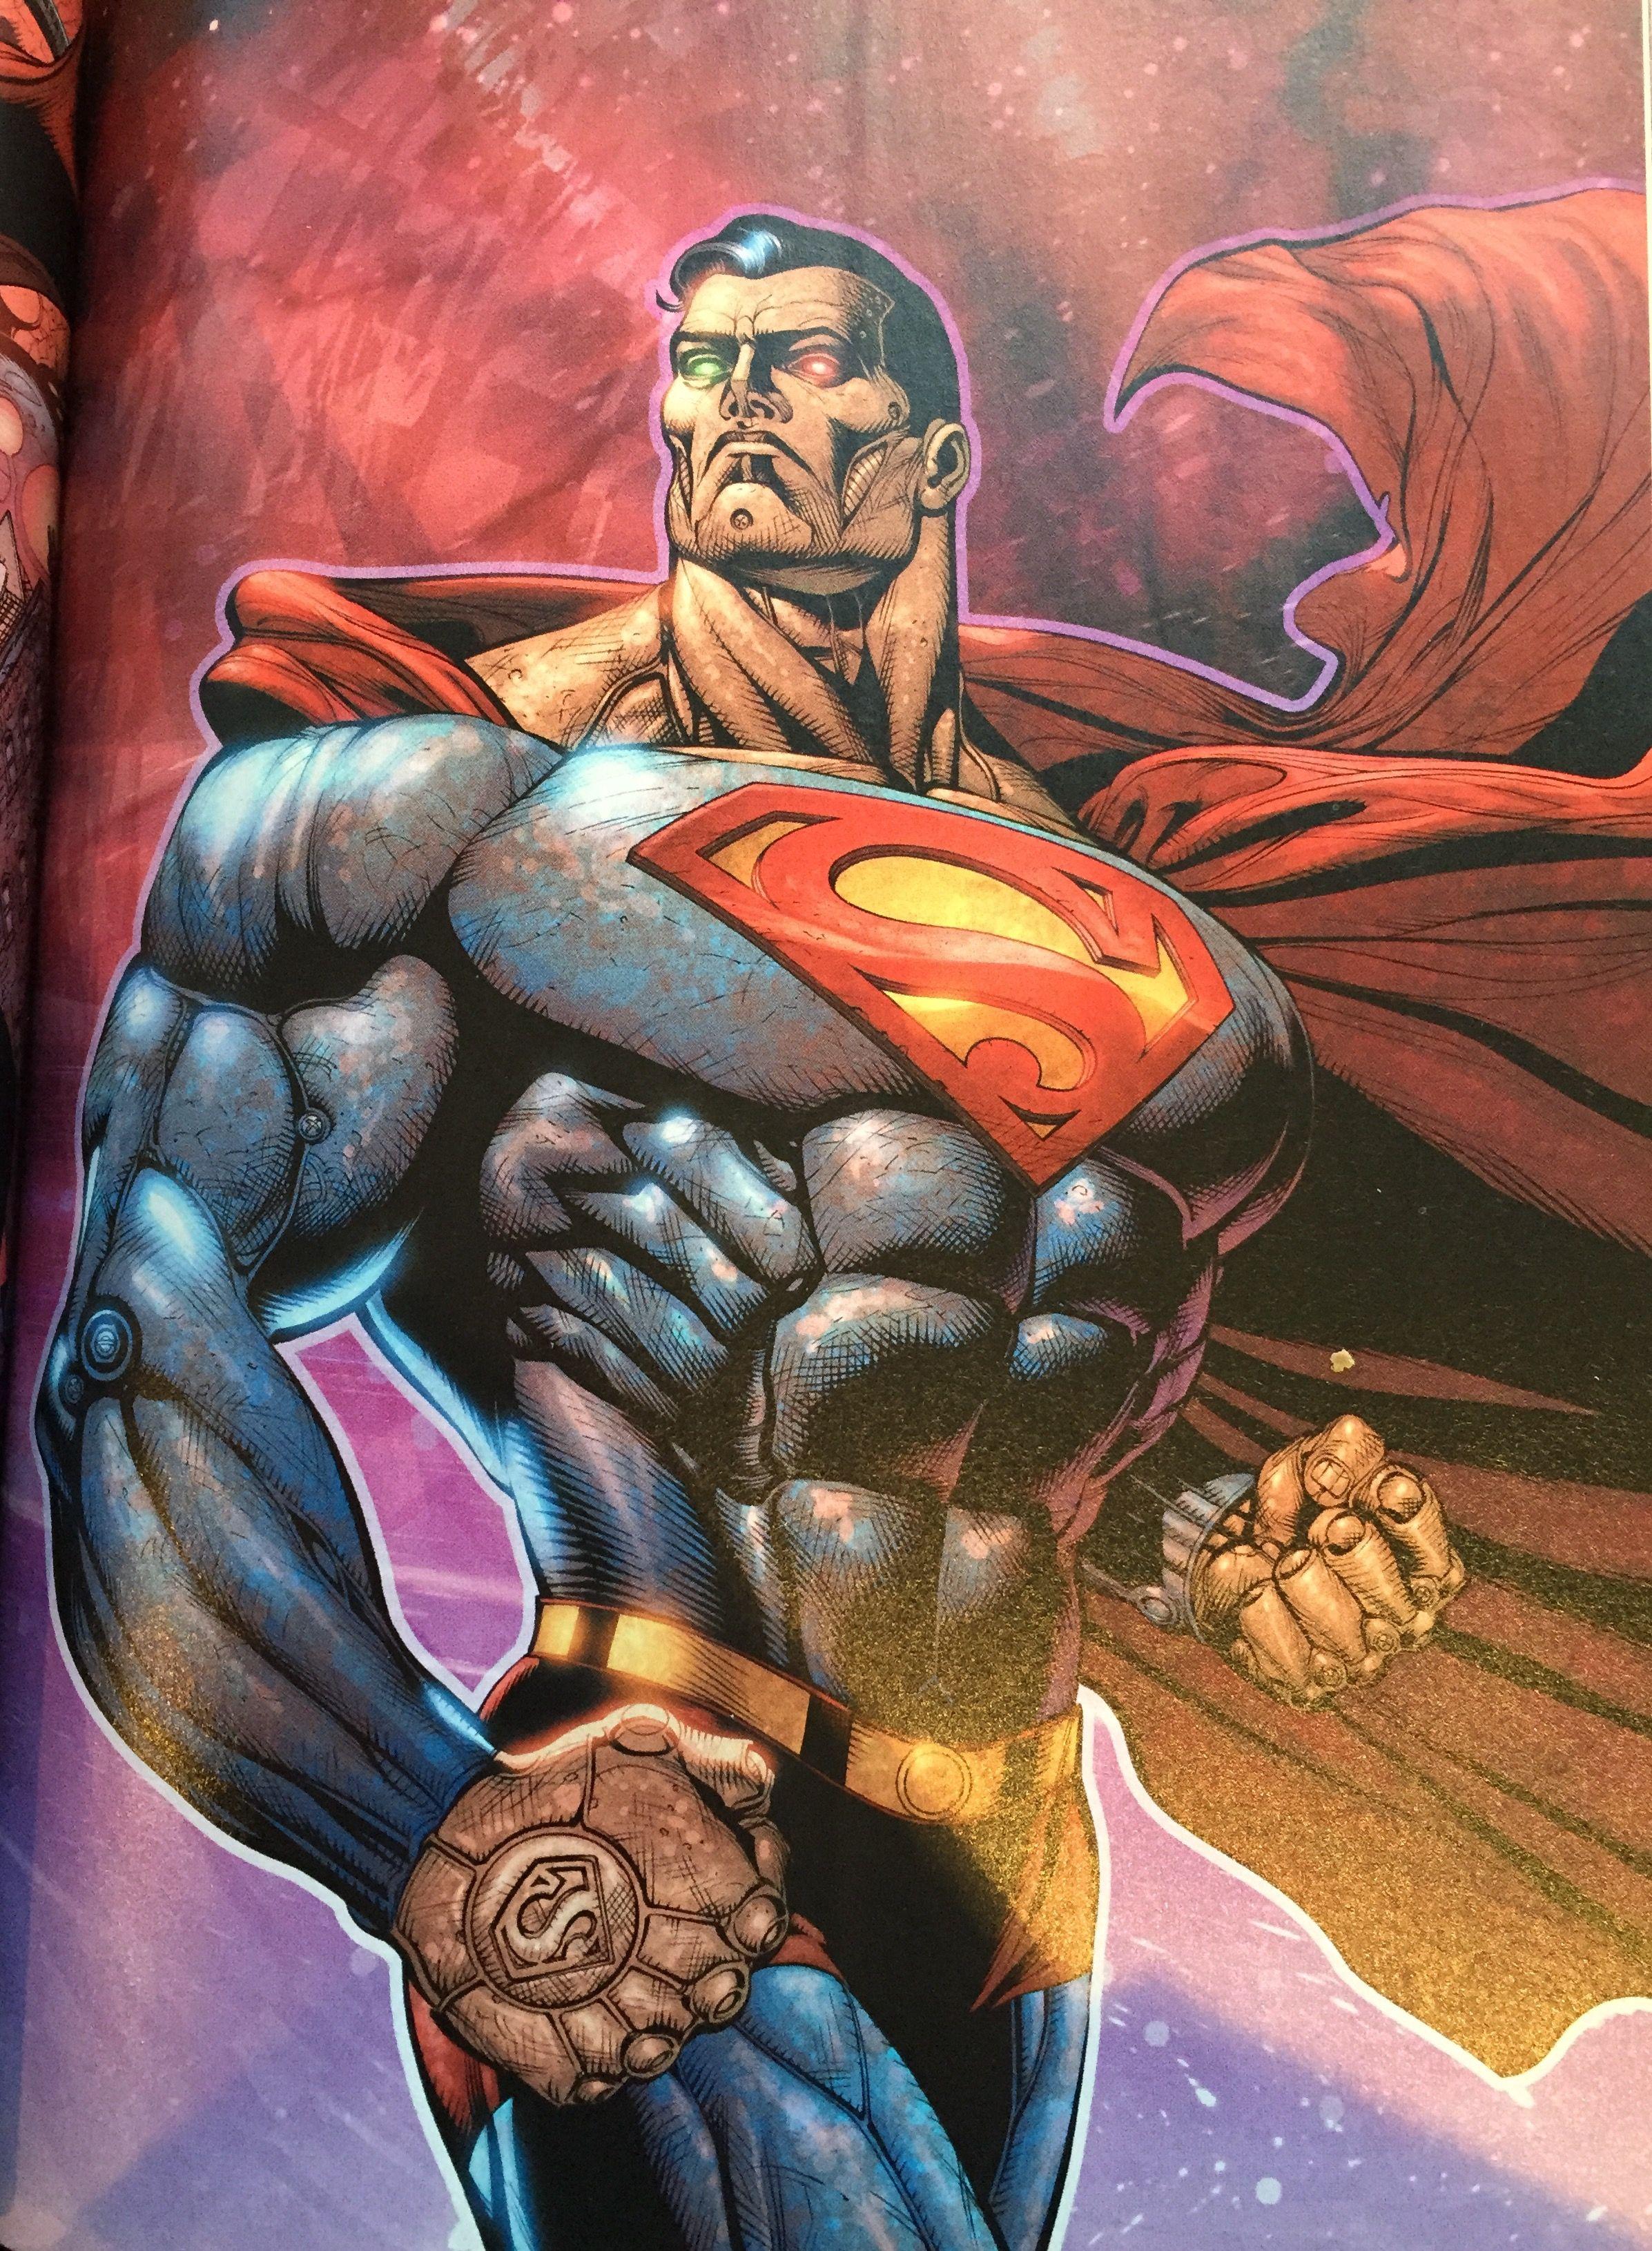 Pin by Ray Austin on Superman | Fun comics, Superman, Comic art